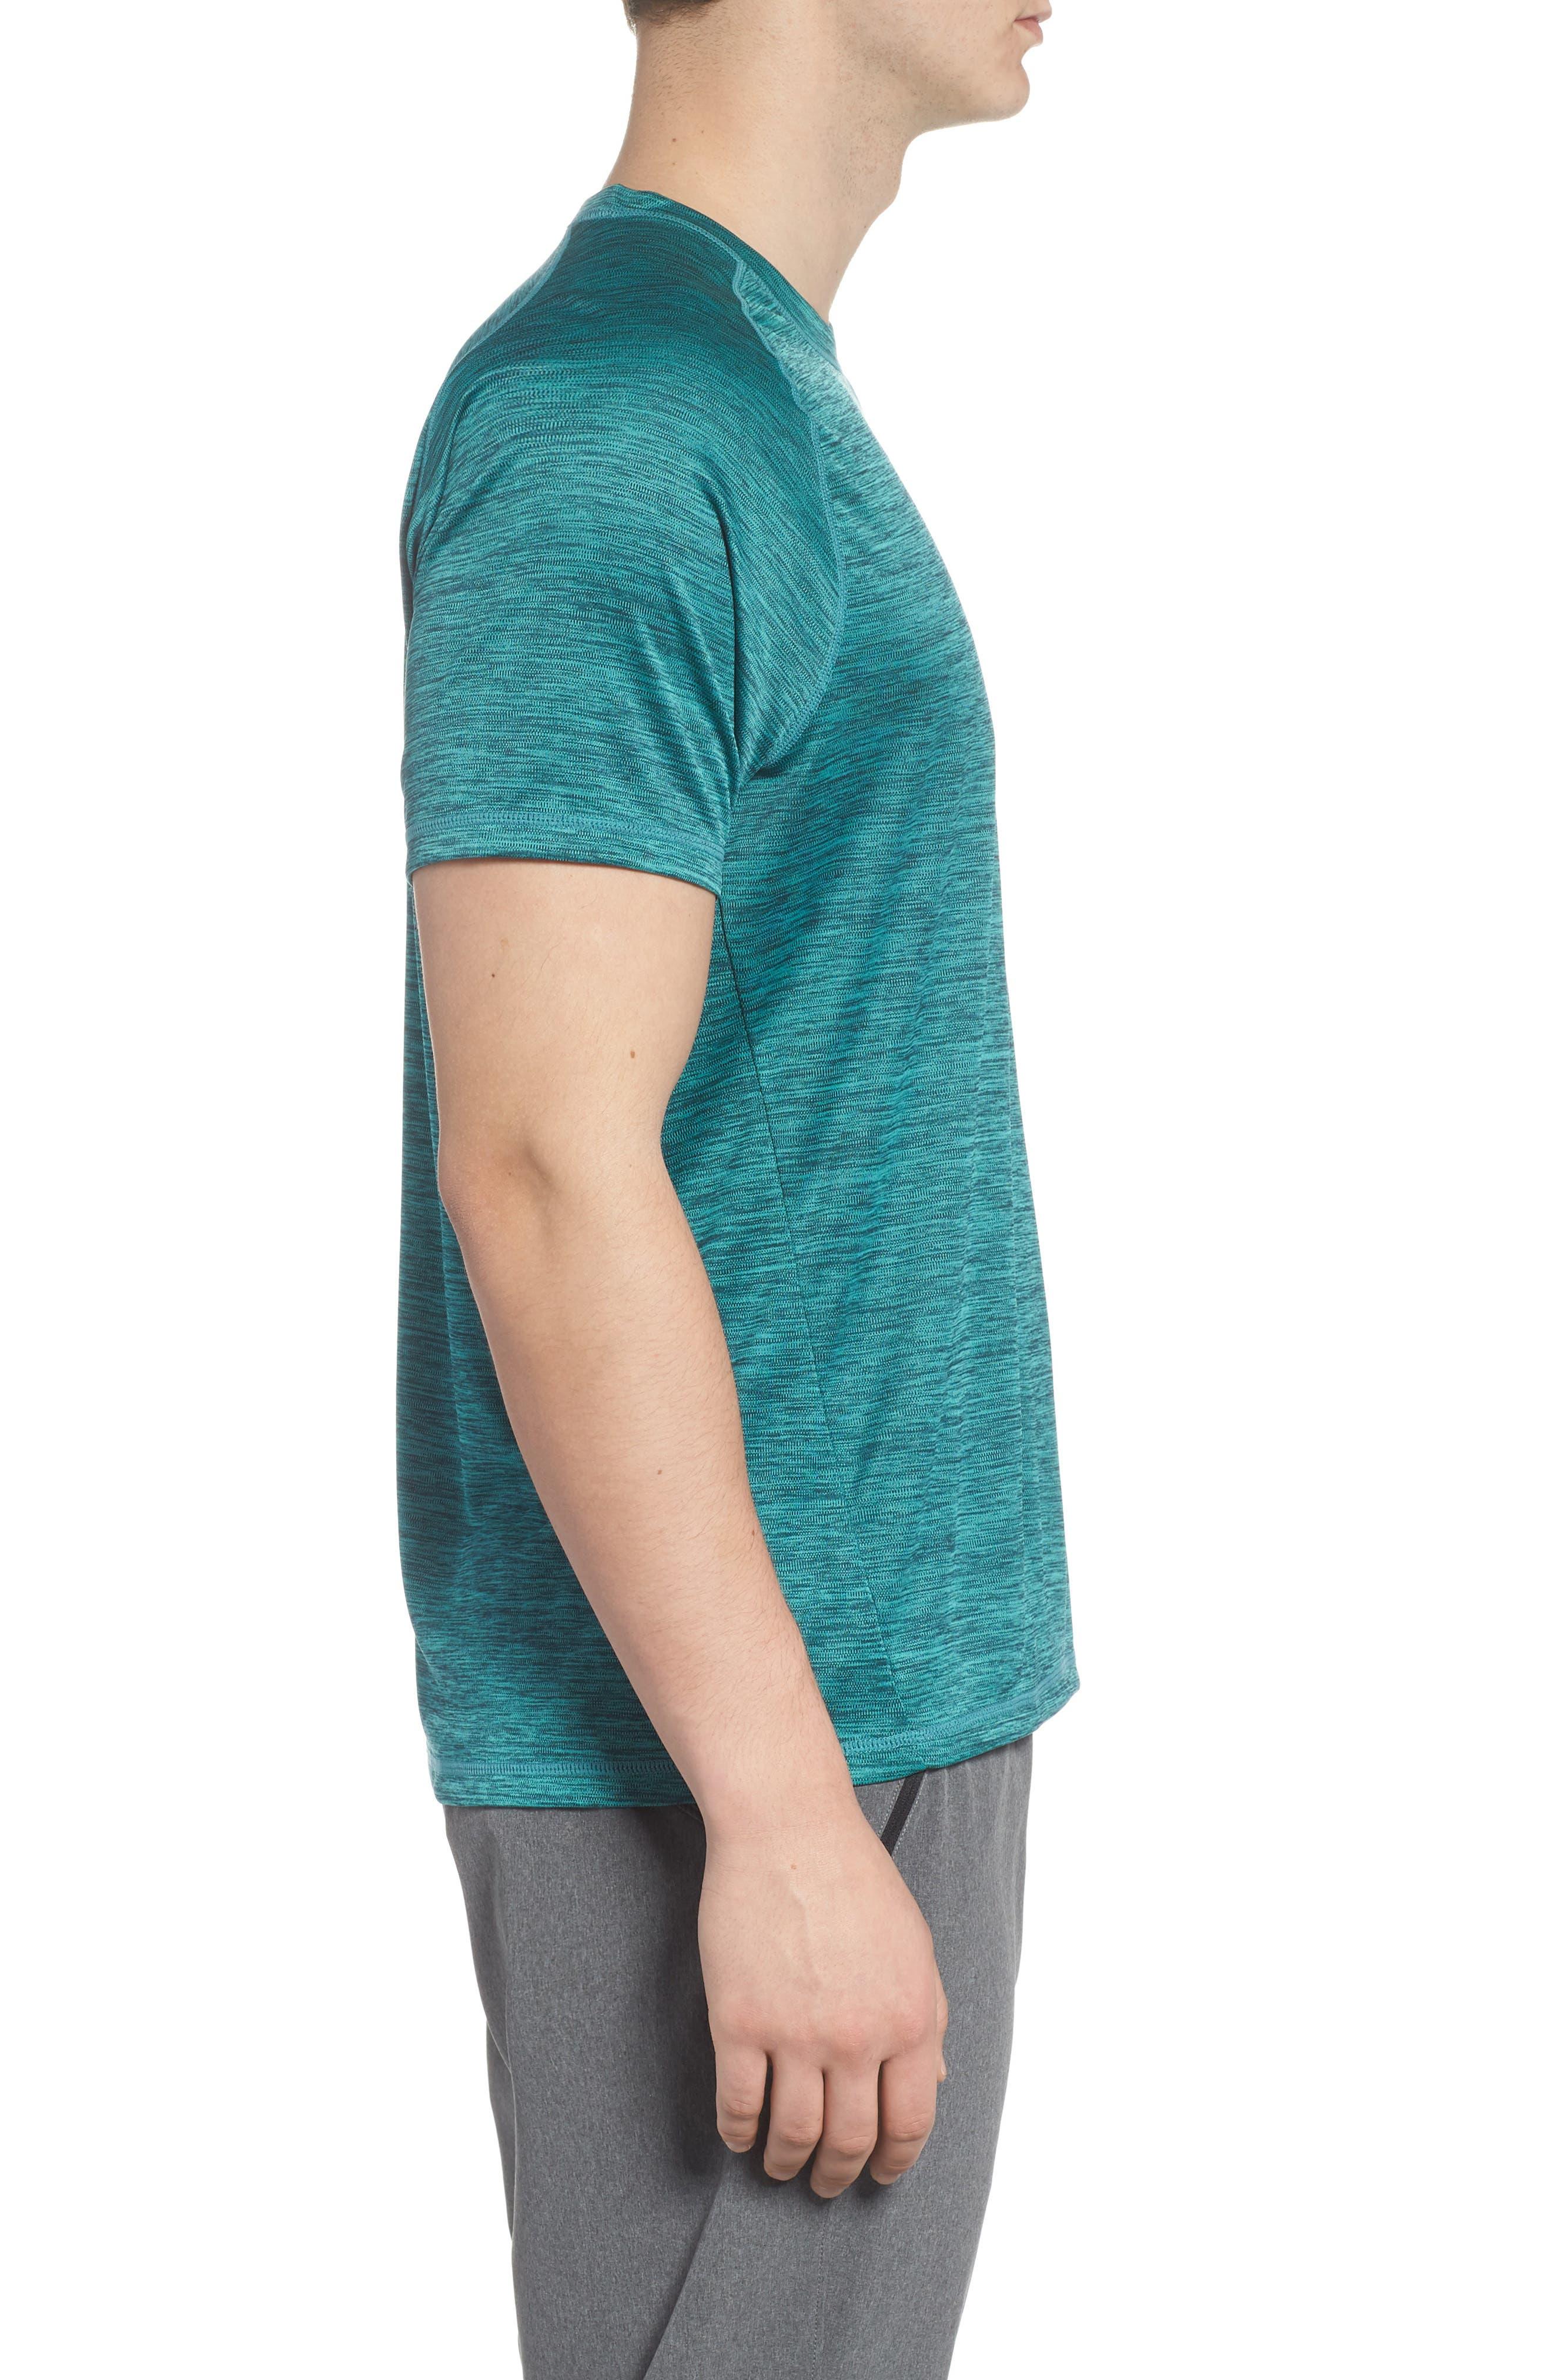 Triplite T-Shirt,                             Alternate thumbnail 3, color,                             Teal Tourmaline Melange